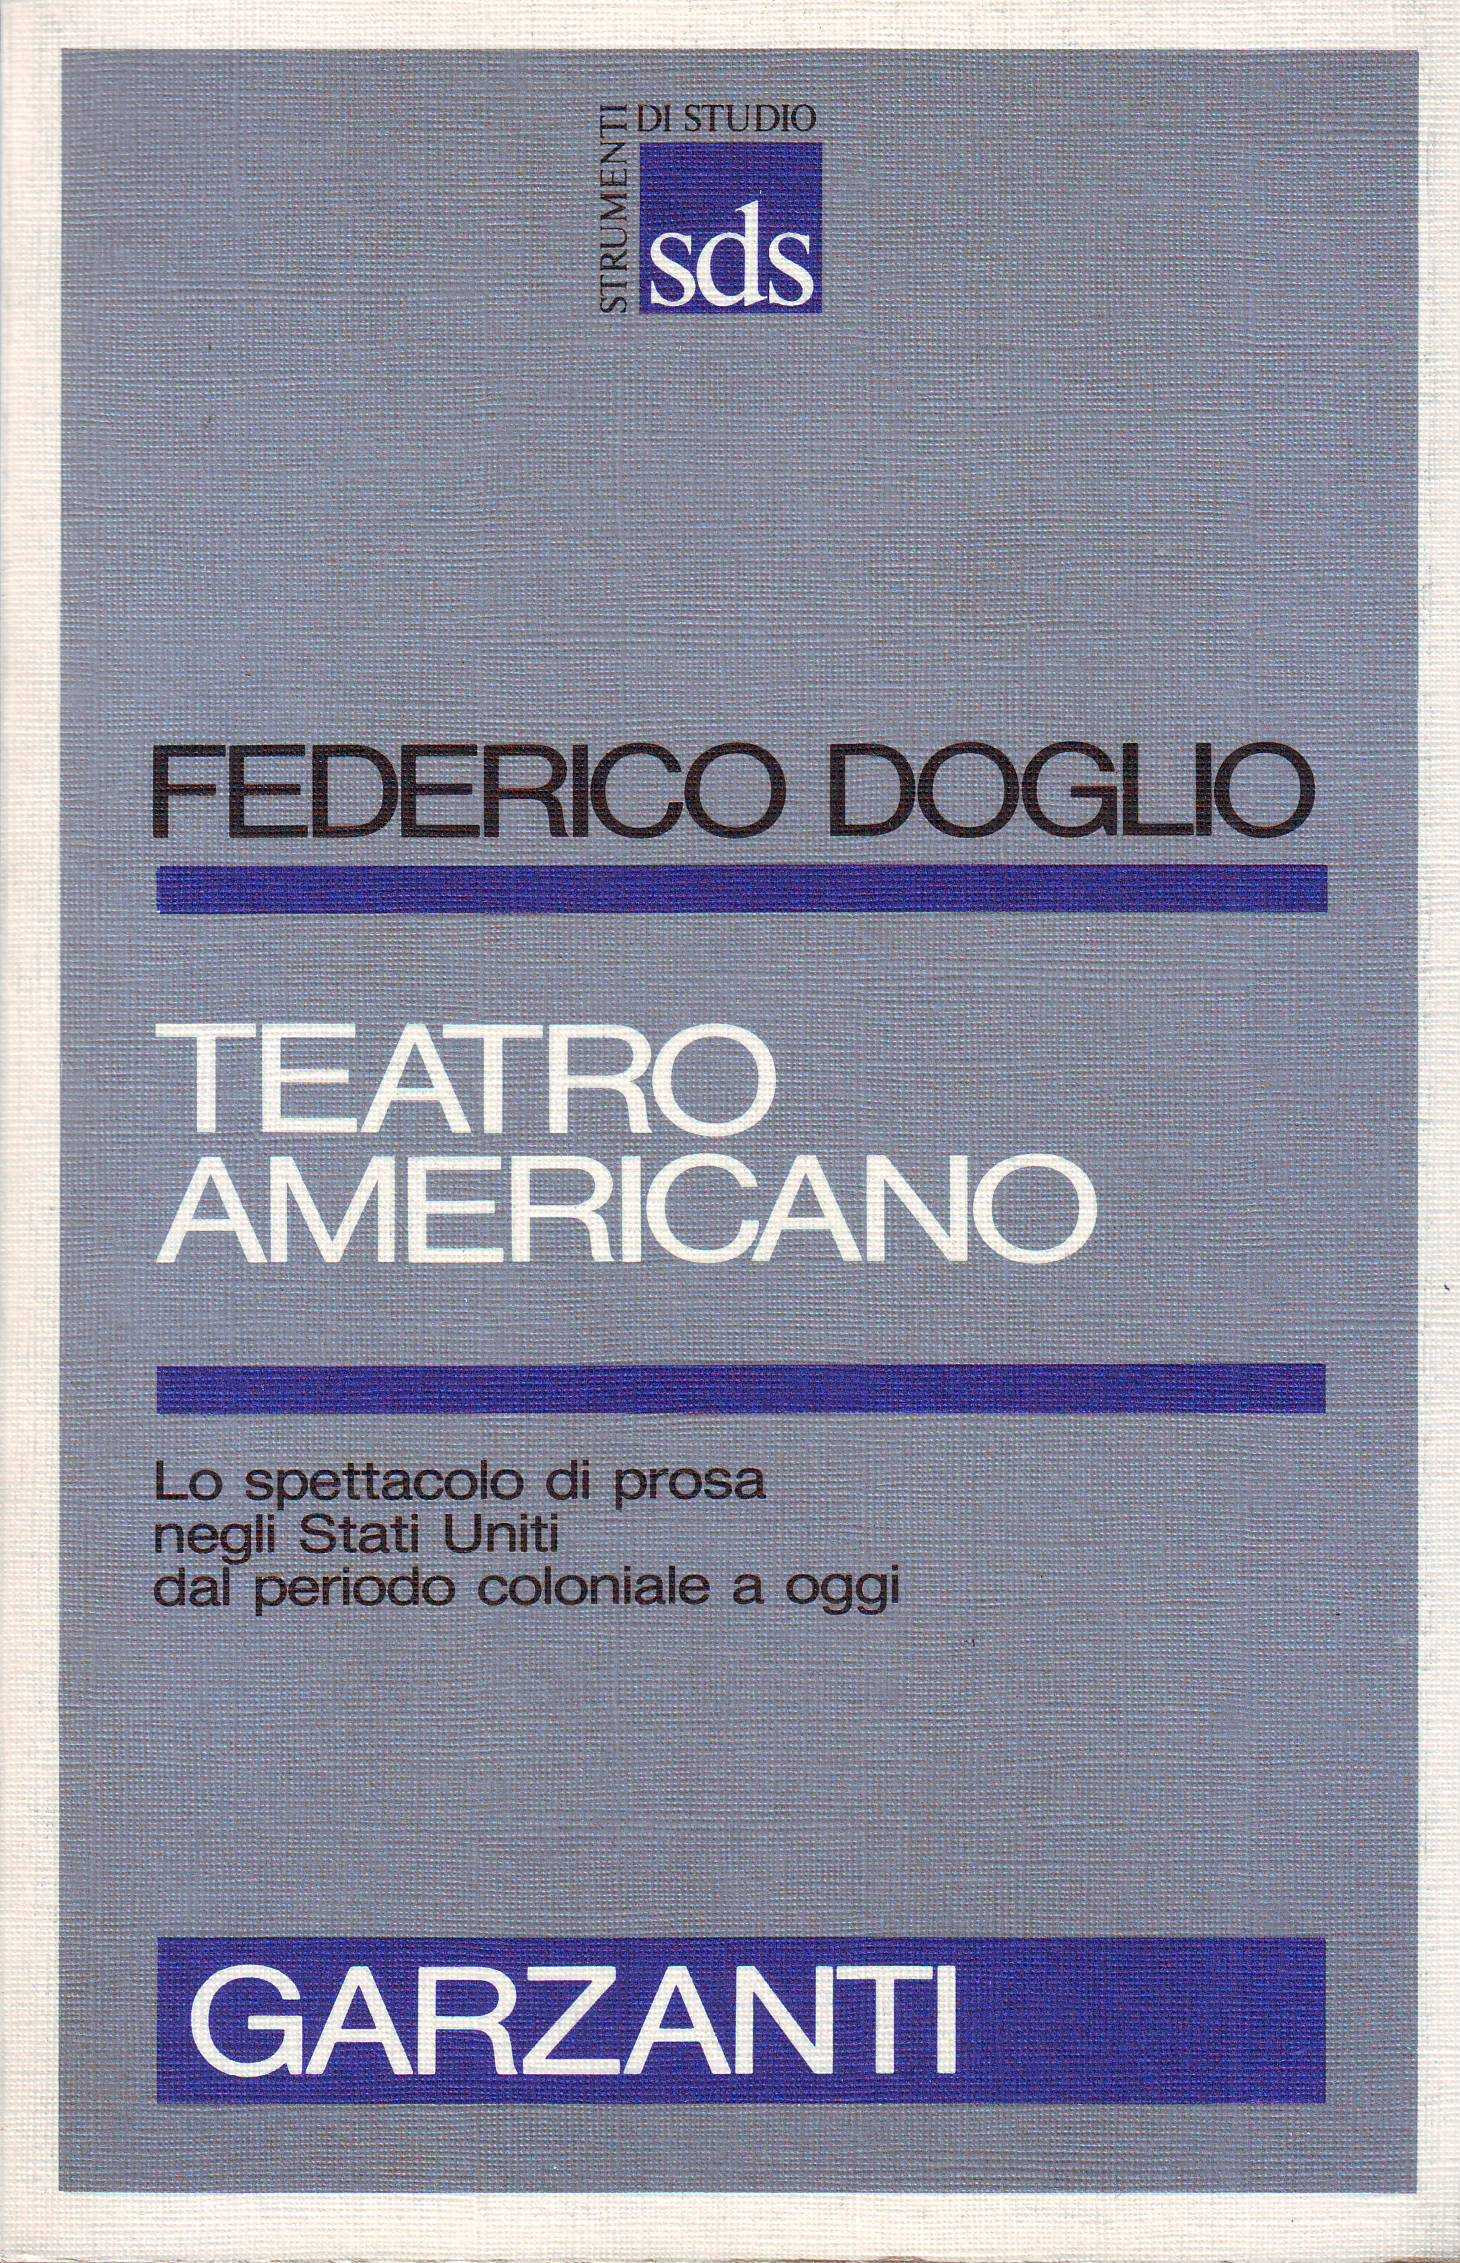 Teatro americano